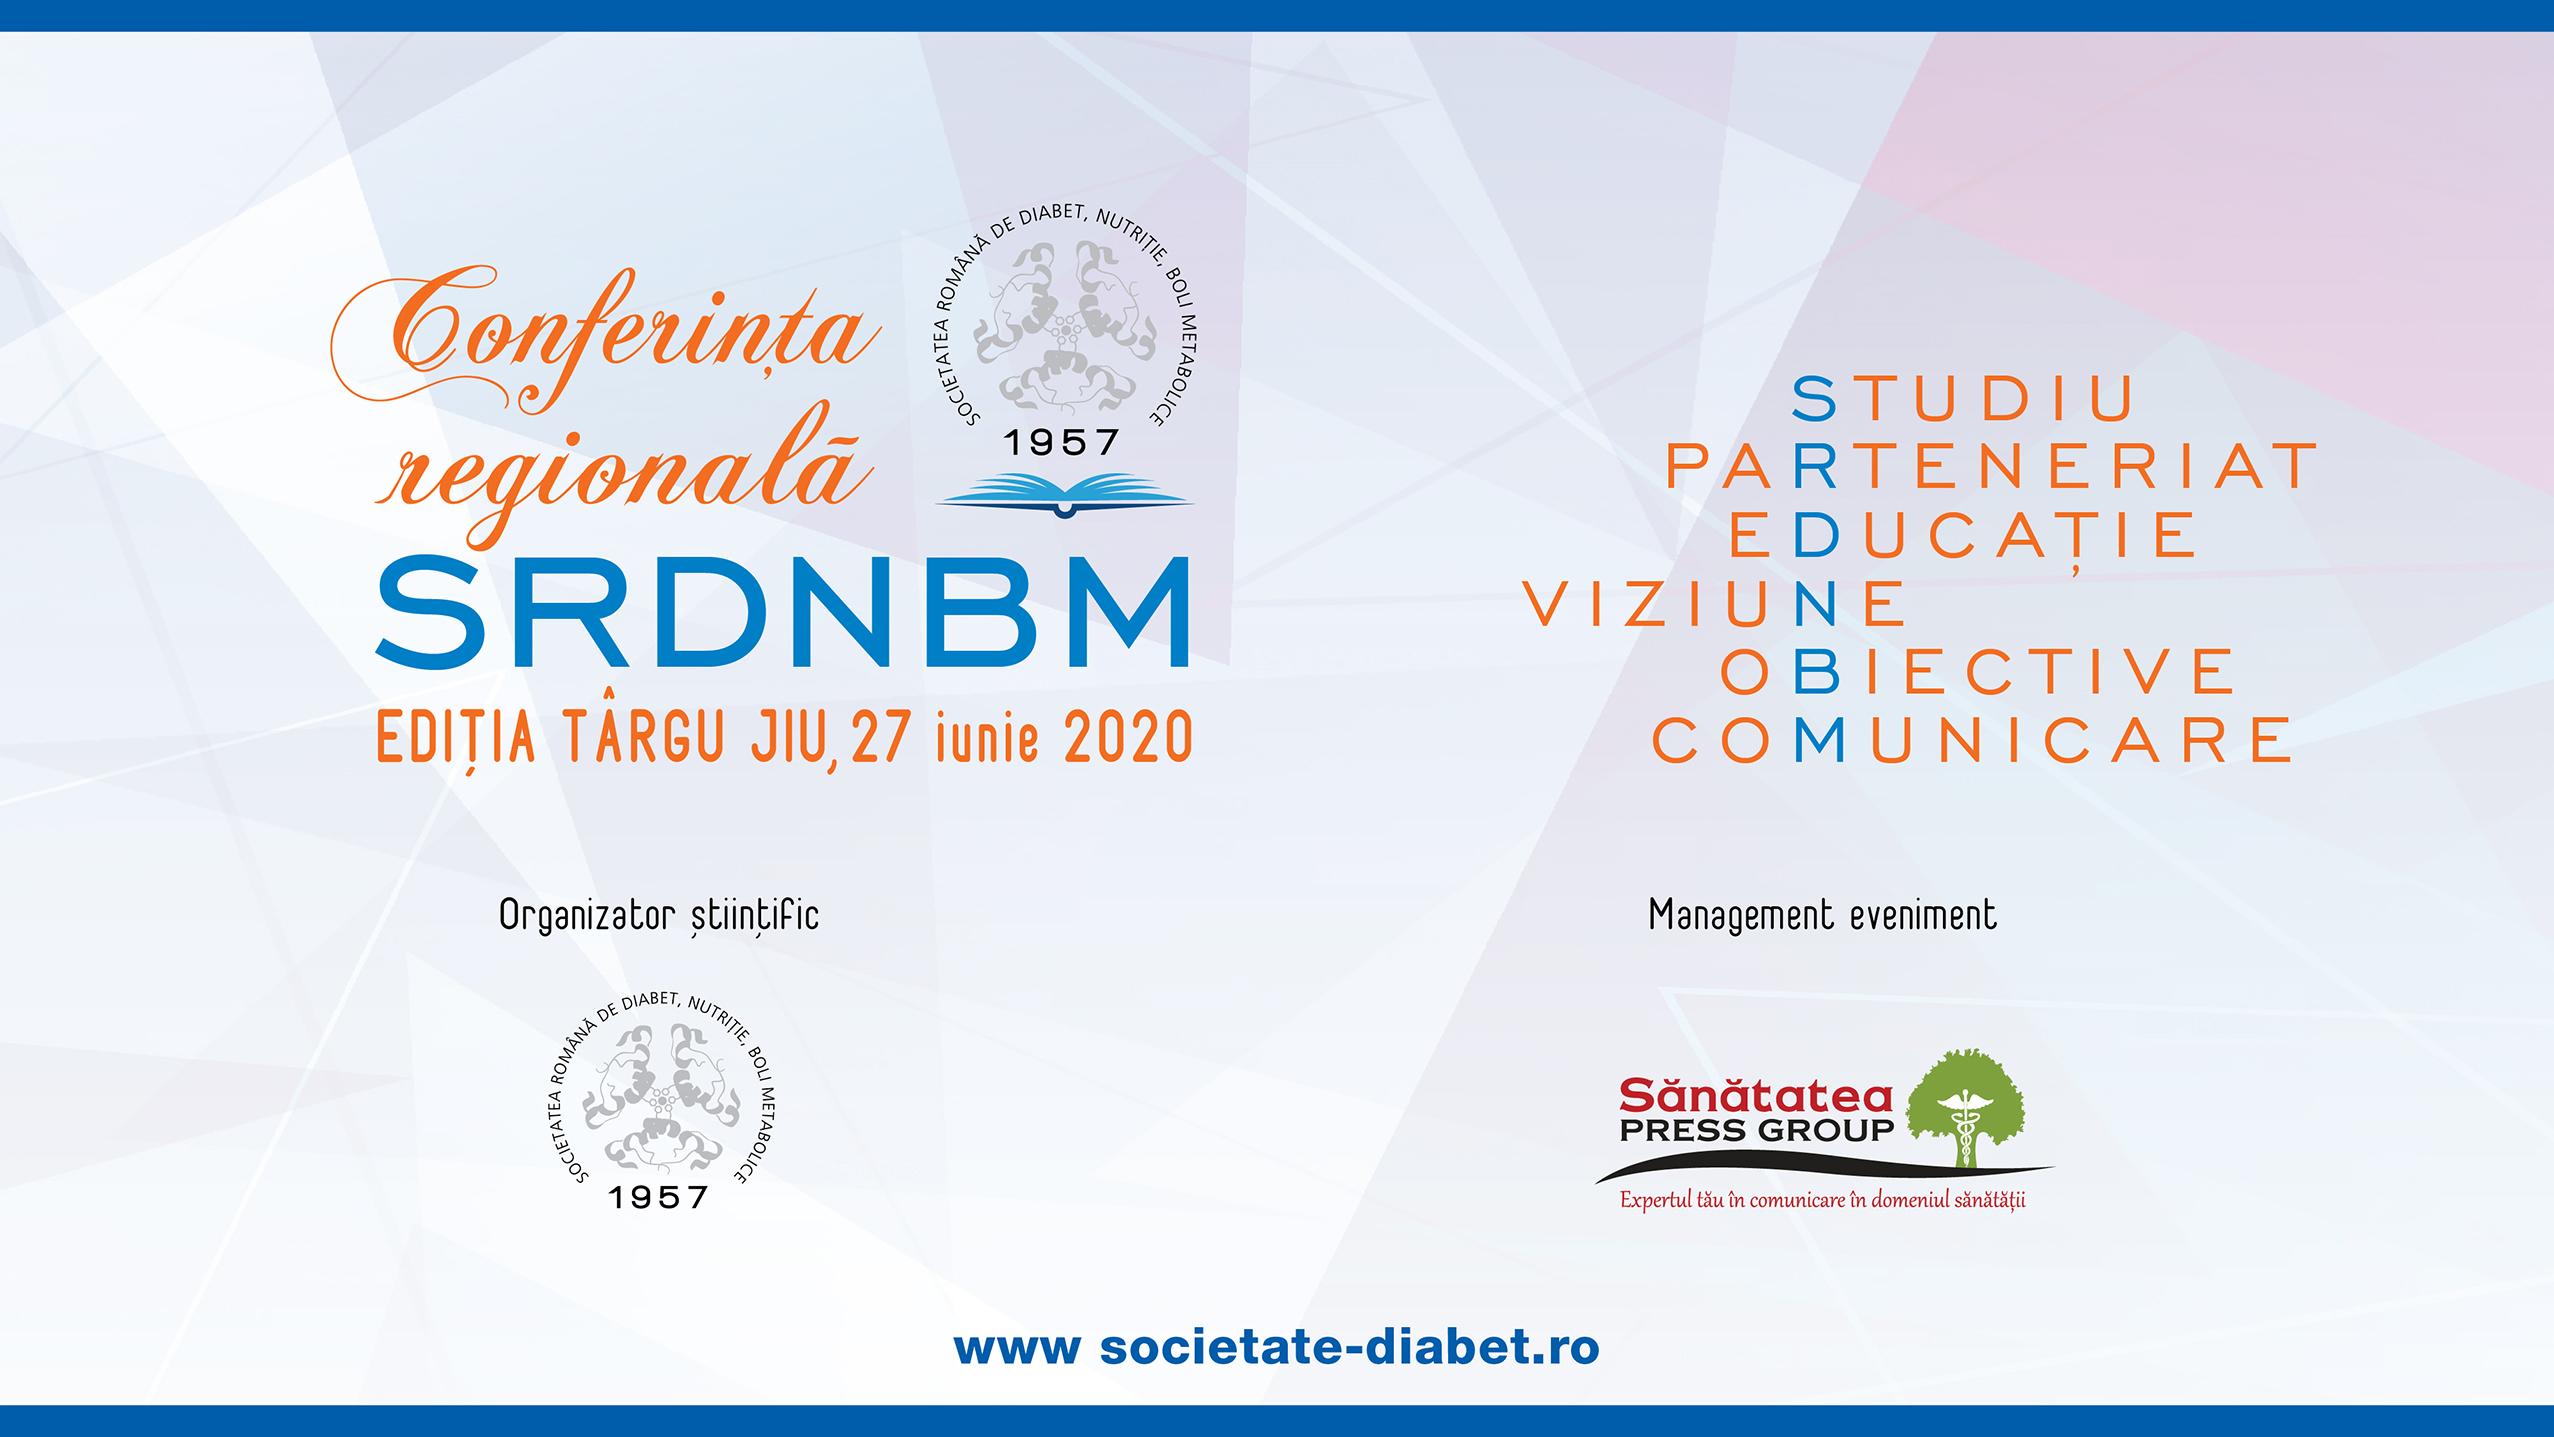 Conferința regională a SRDNBM – Ediția TÂRGU JIU, 27 iunie 2020